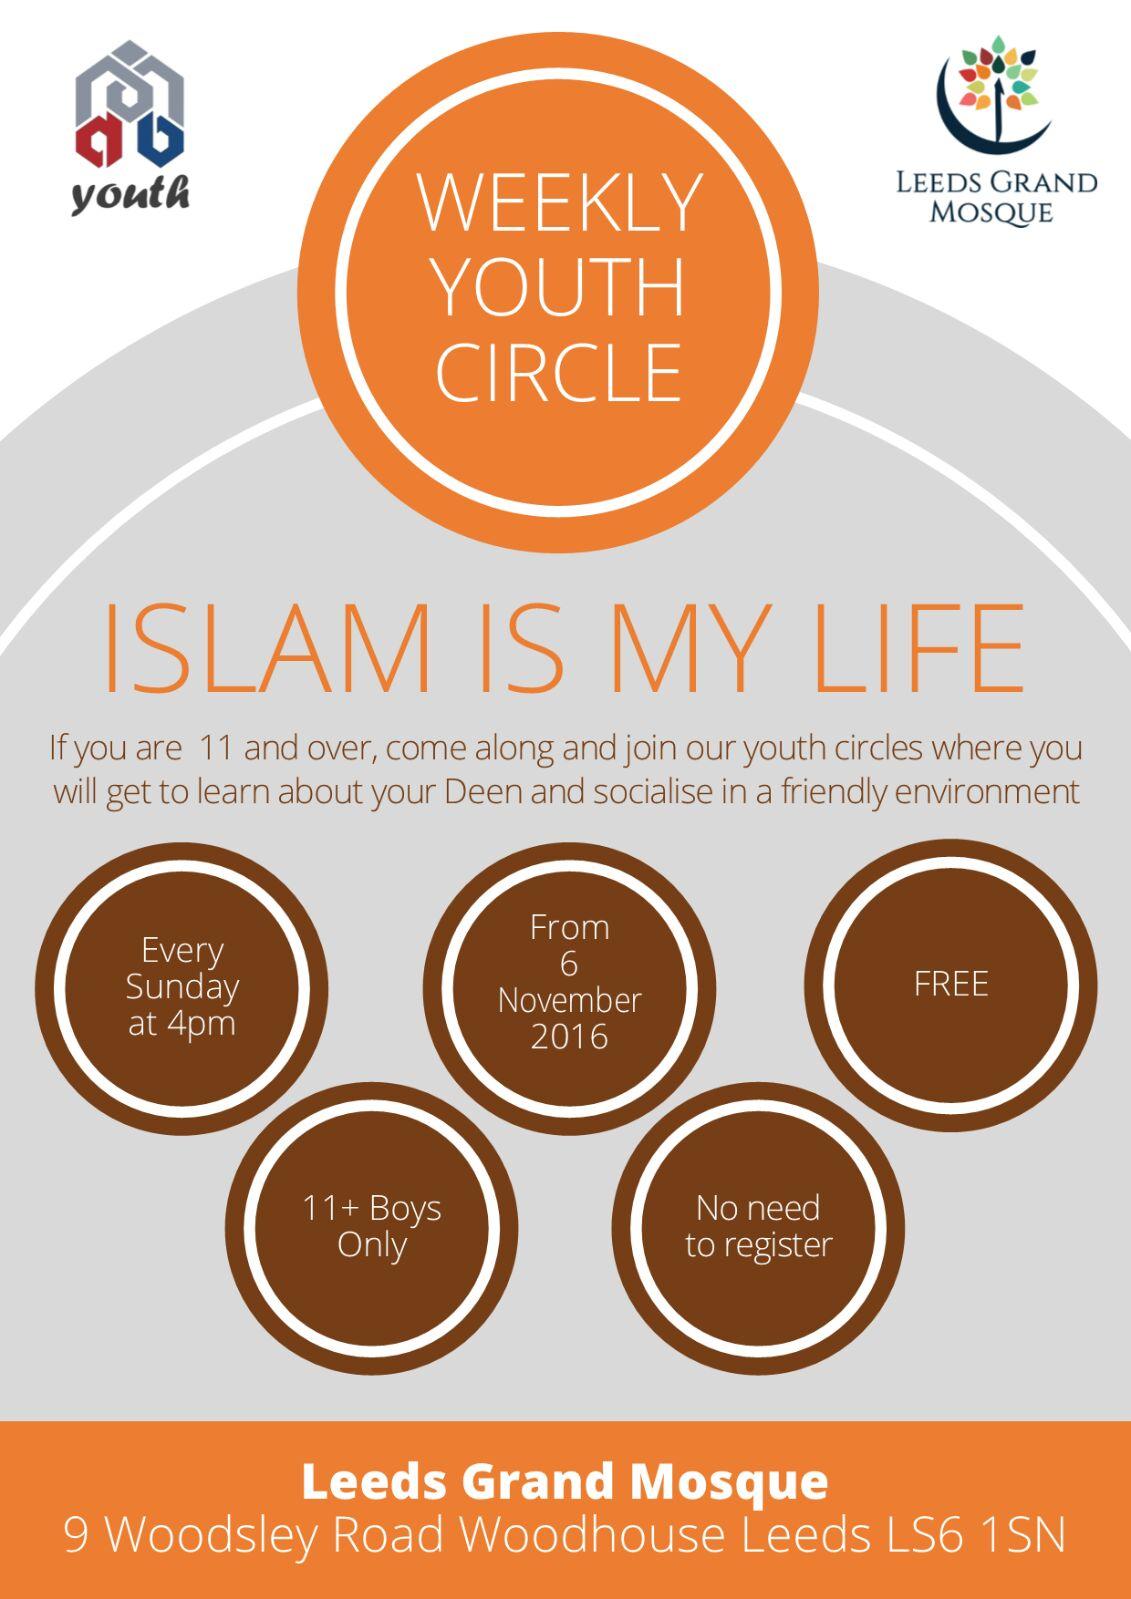 Weekly Youth Circle - Islam is My life